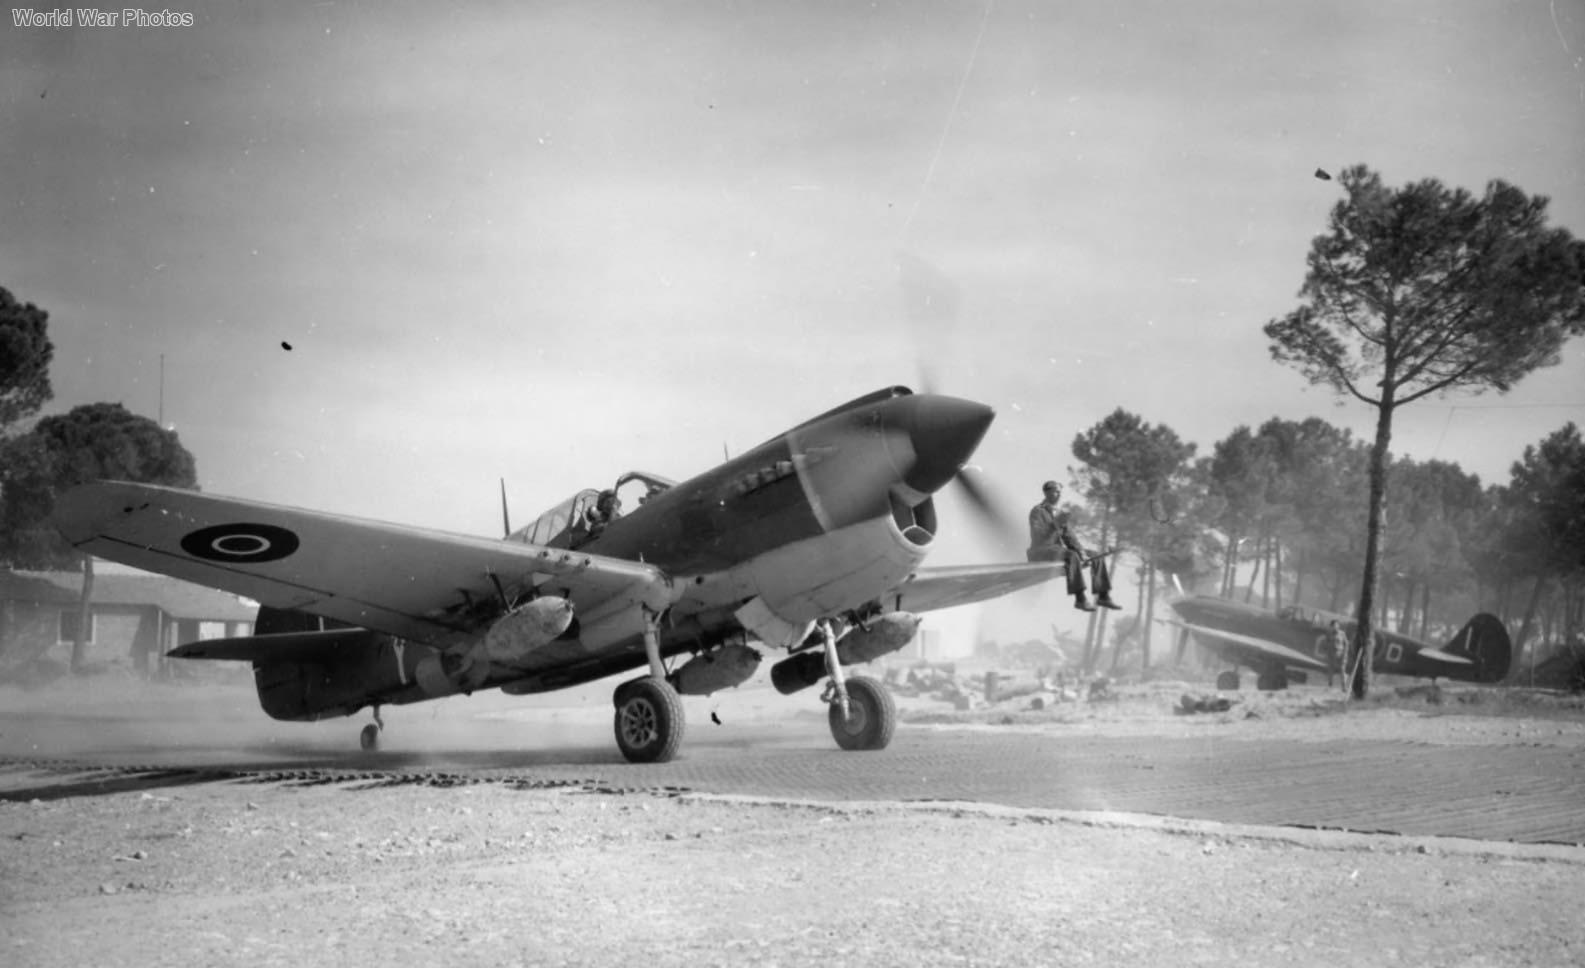 Kittyhawk Mk IV FX745 OK-Y of No. 450 Squadron RAAF, Cervia, Italy